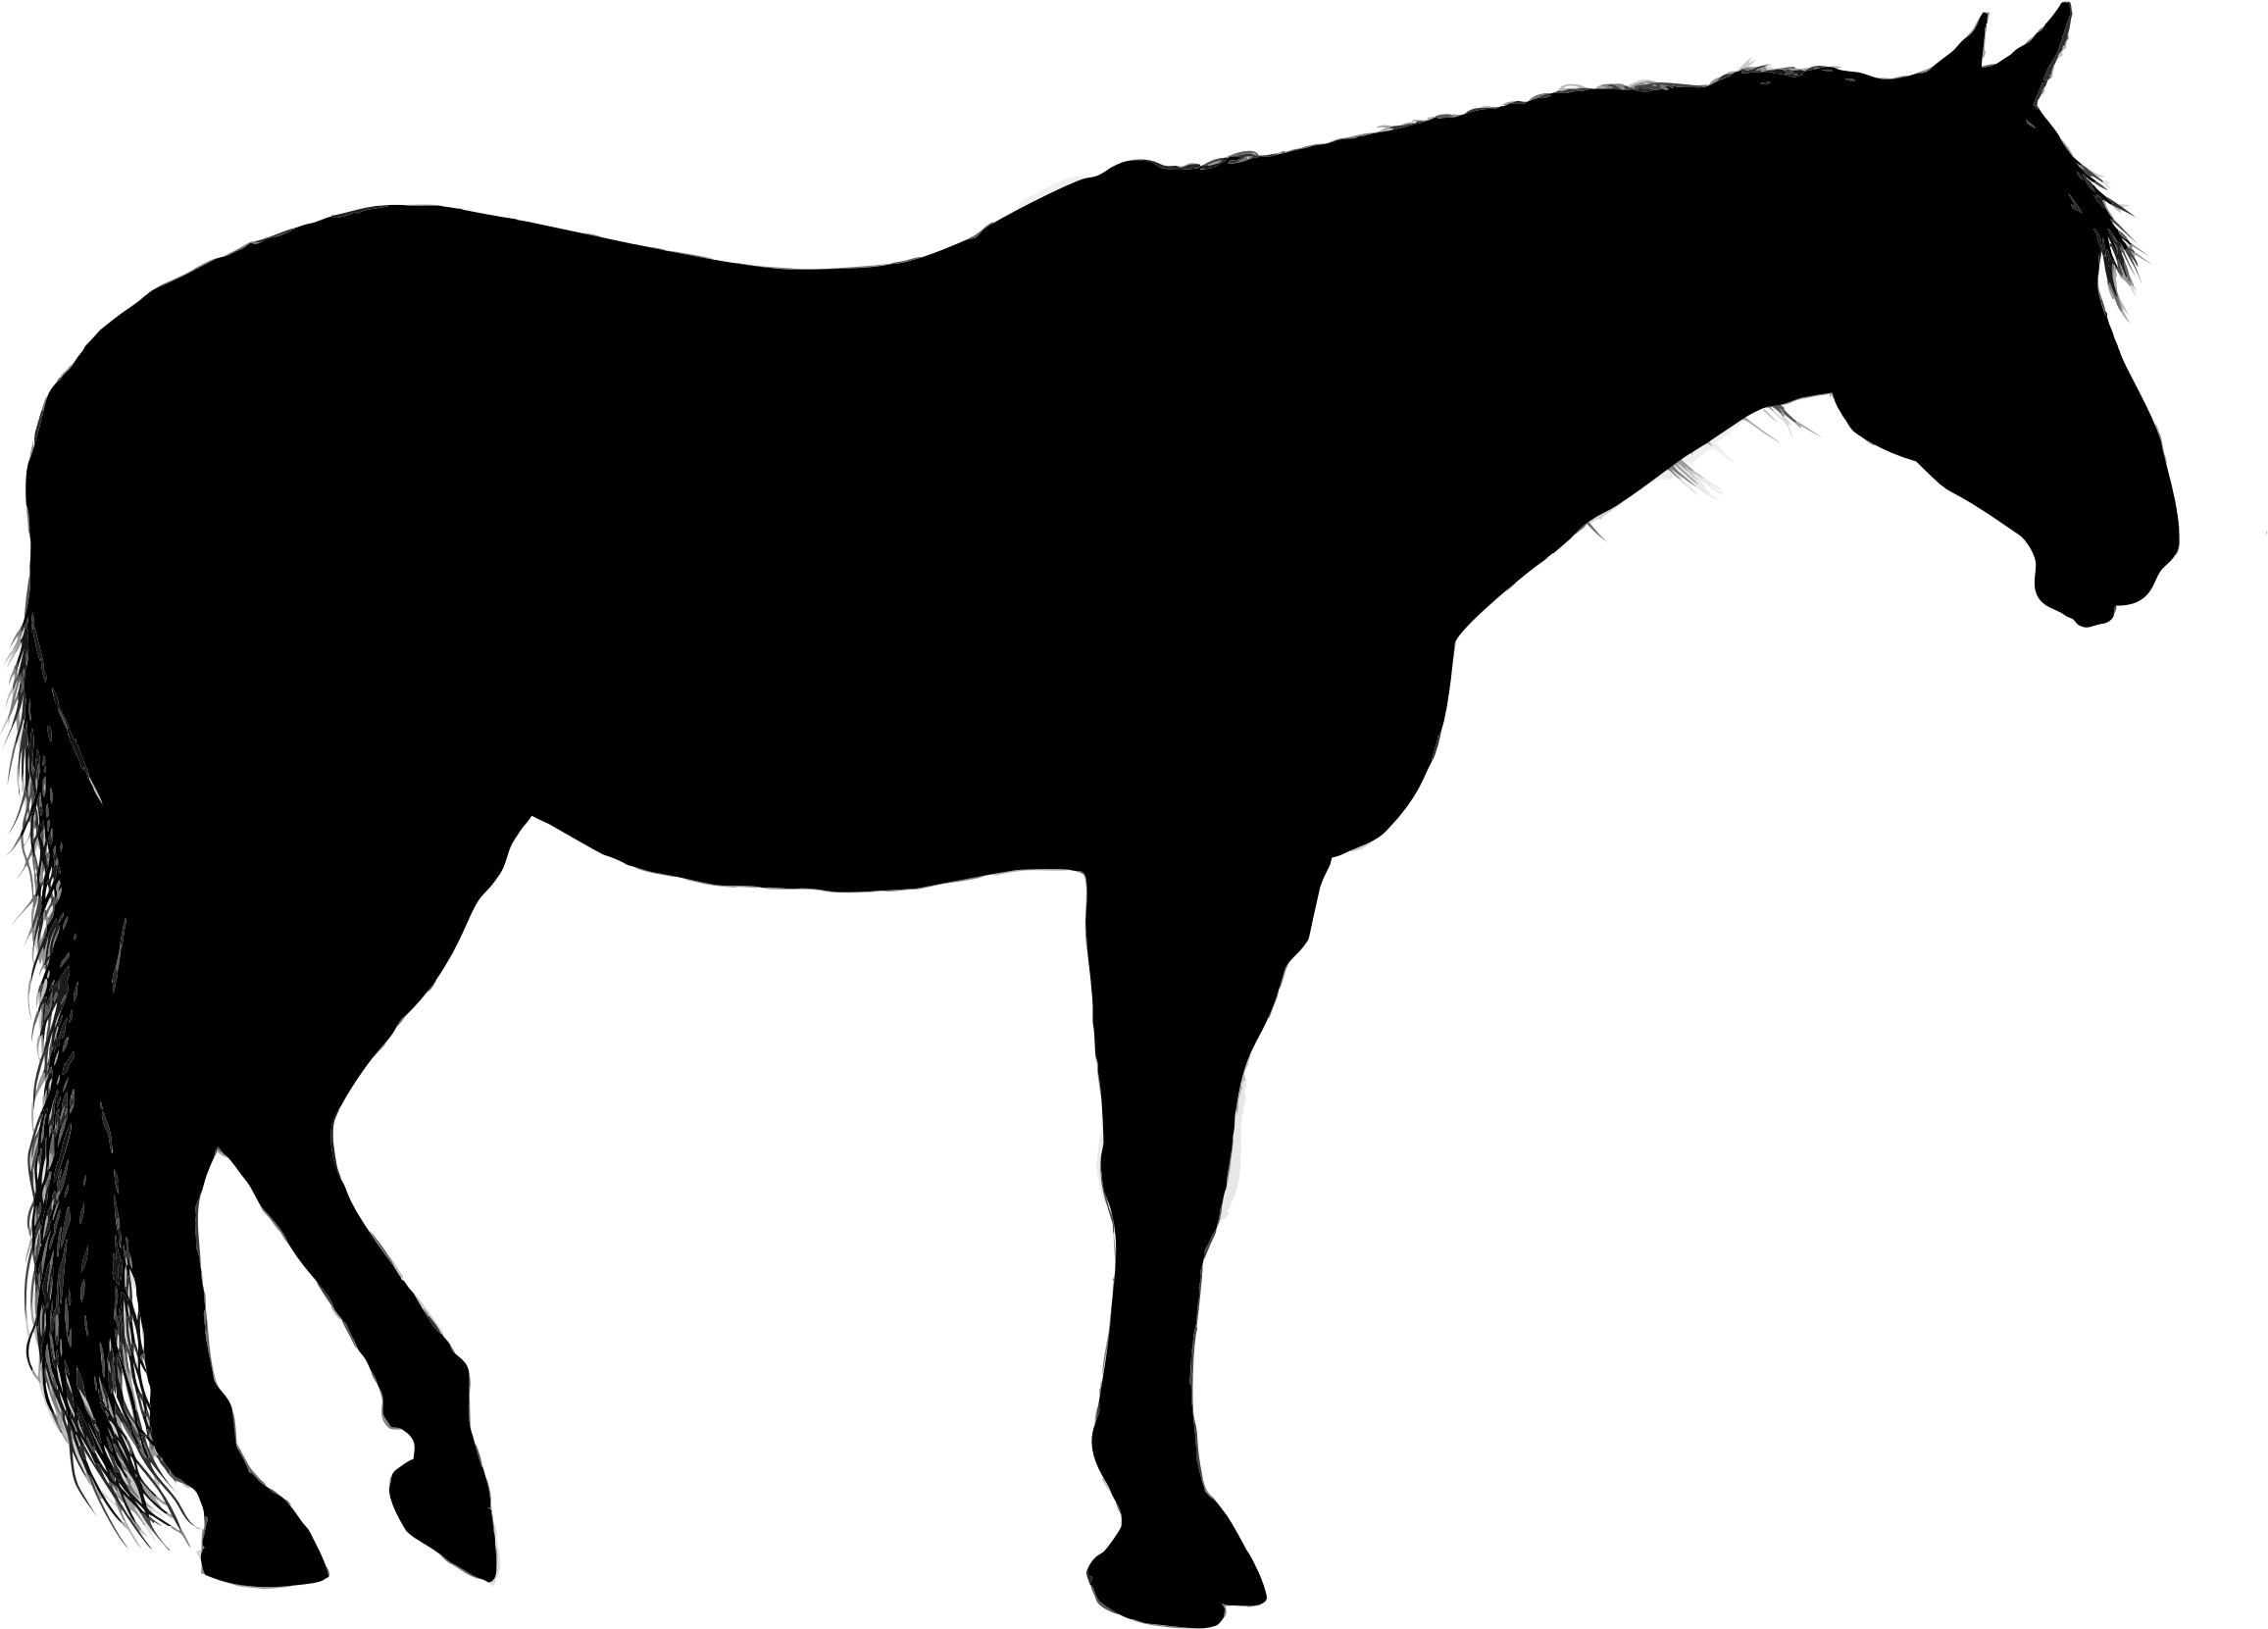 2313x1661 Horse Silhouette